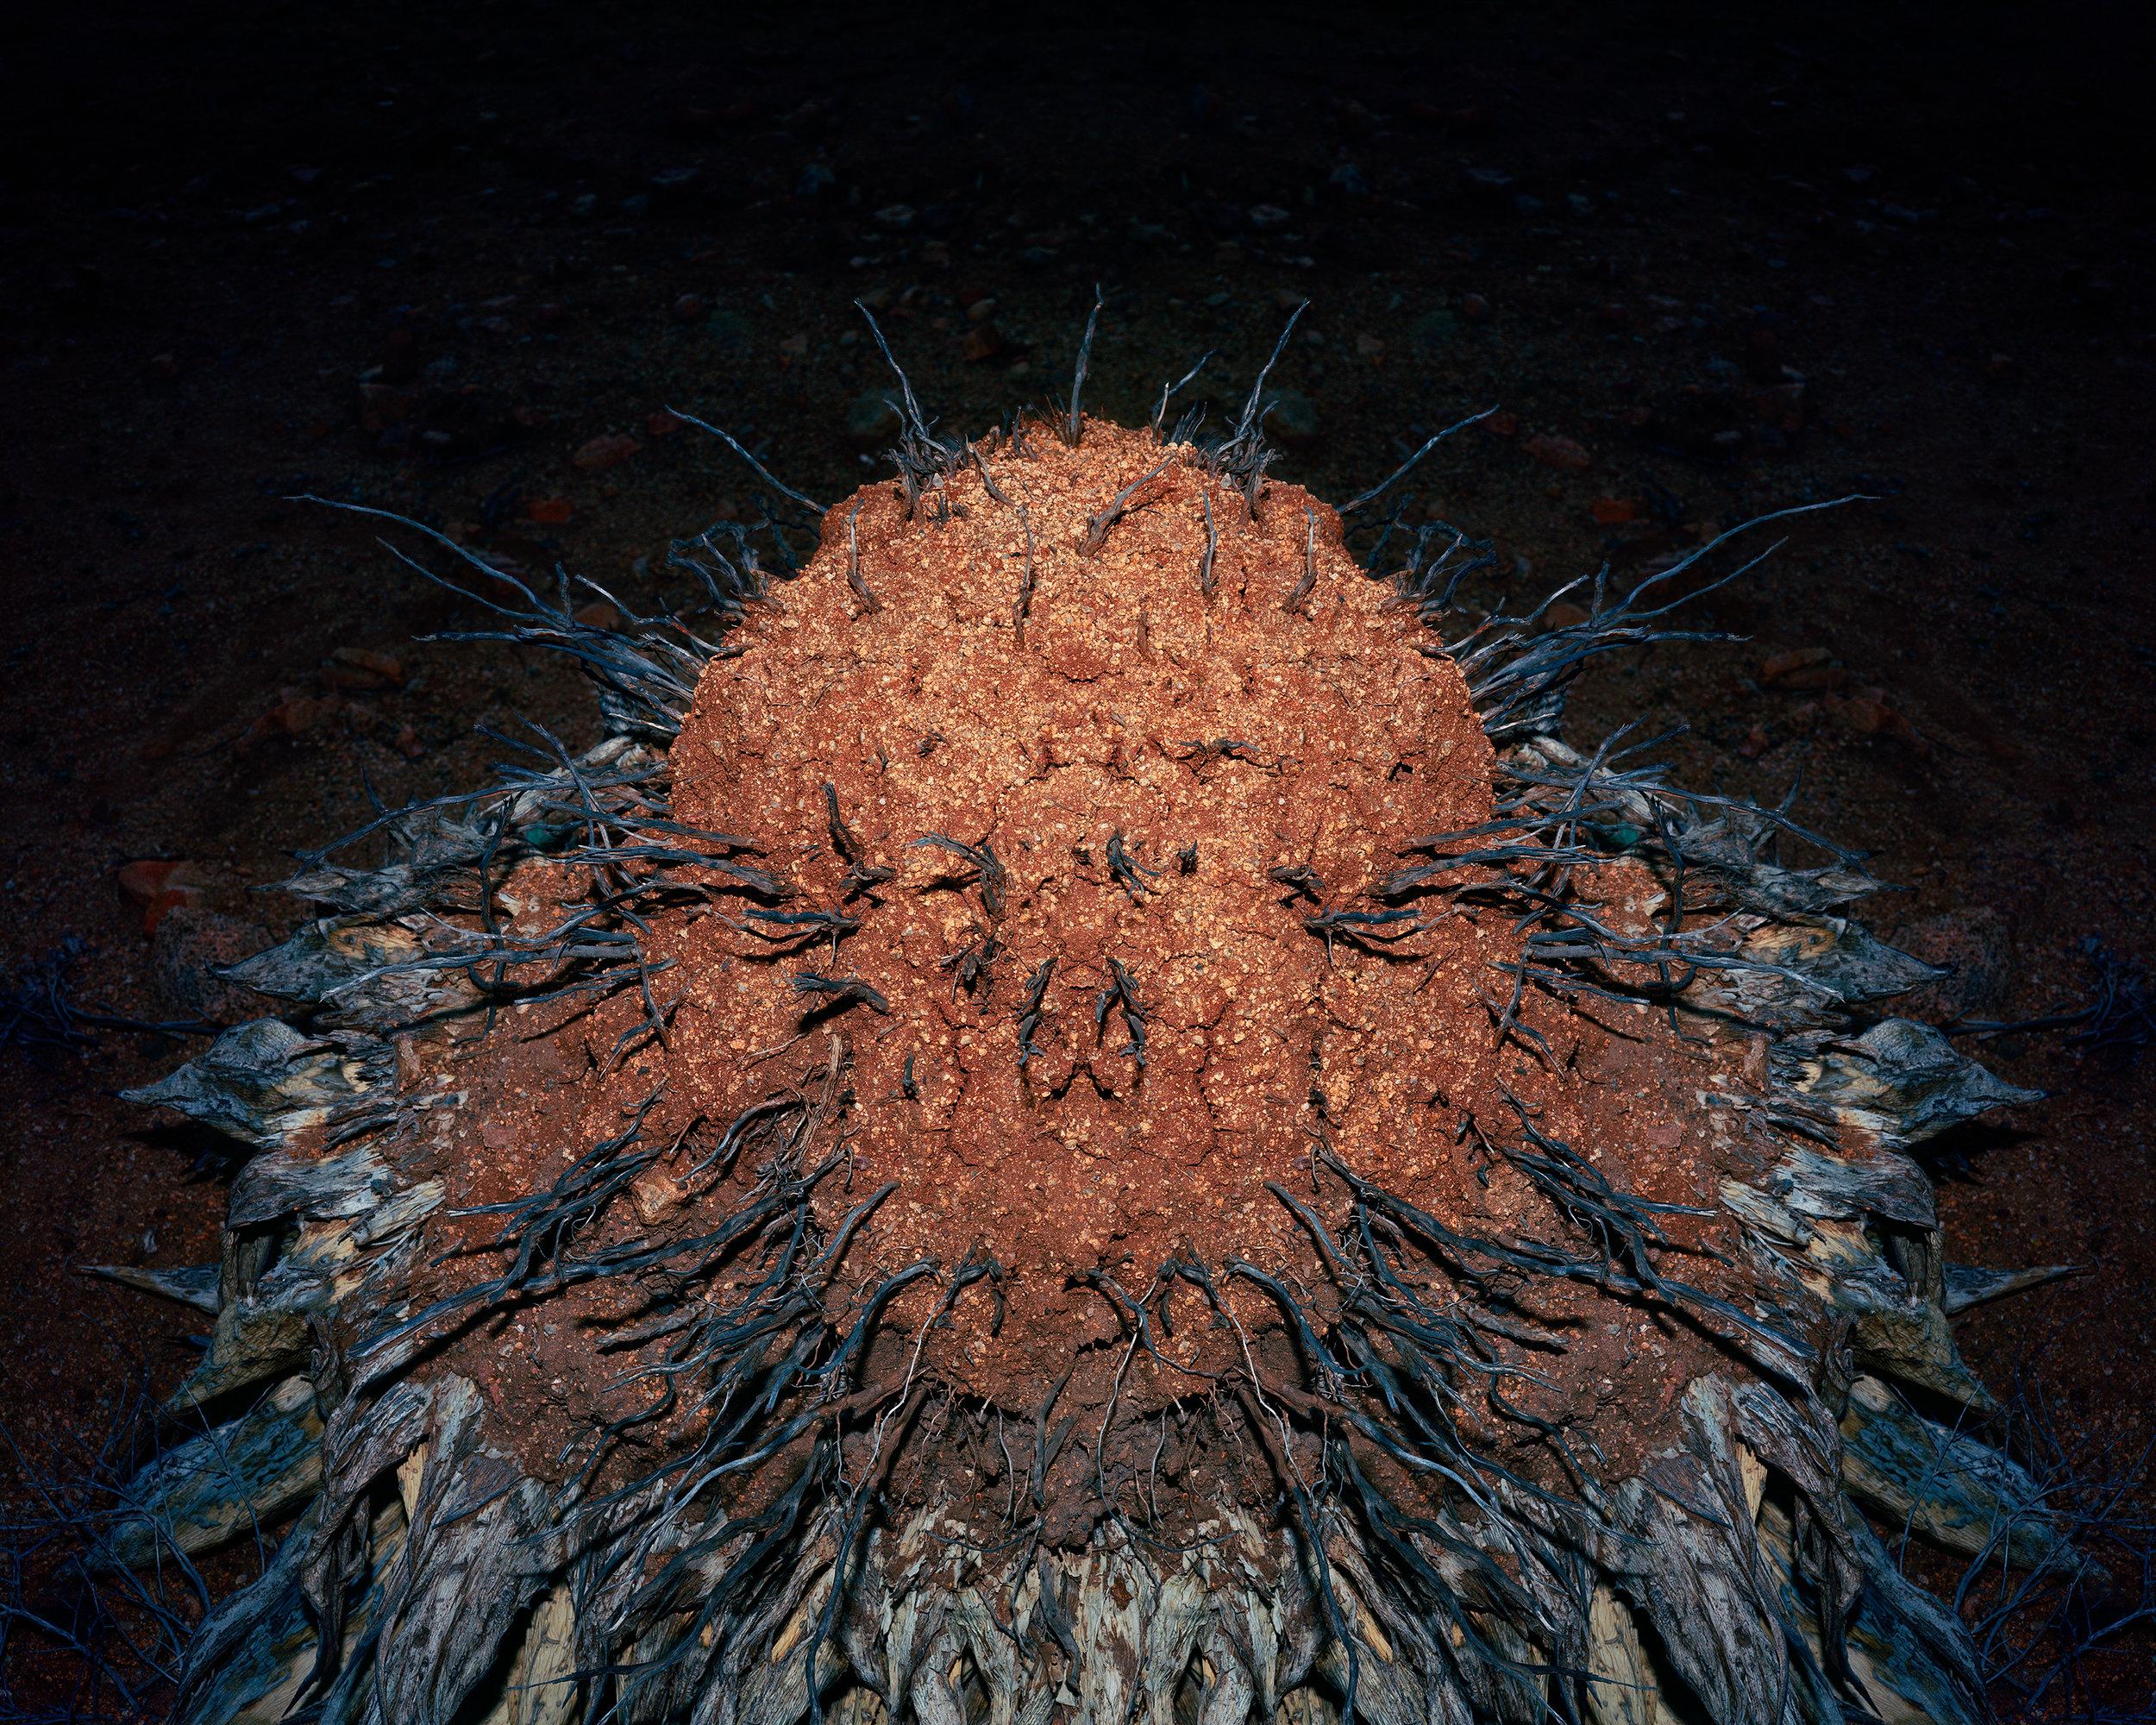 MICHAEL LUNDGREN  Nova, 2014  Archival pigment print 32 x 40 in ed. 7 + 1AP